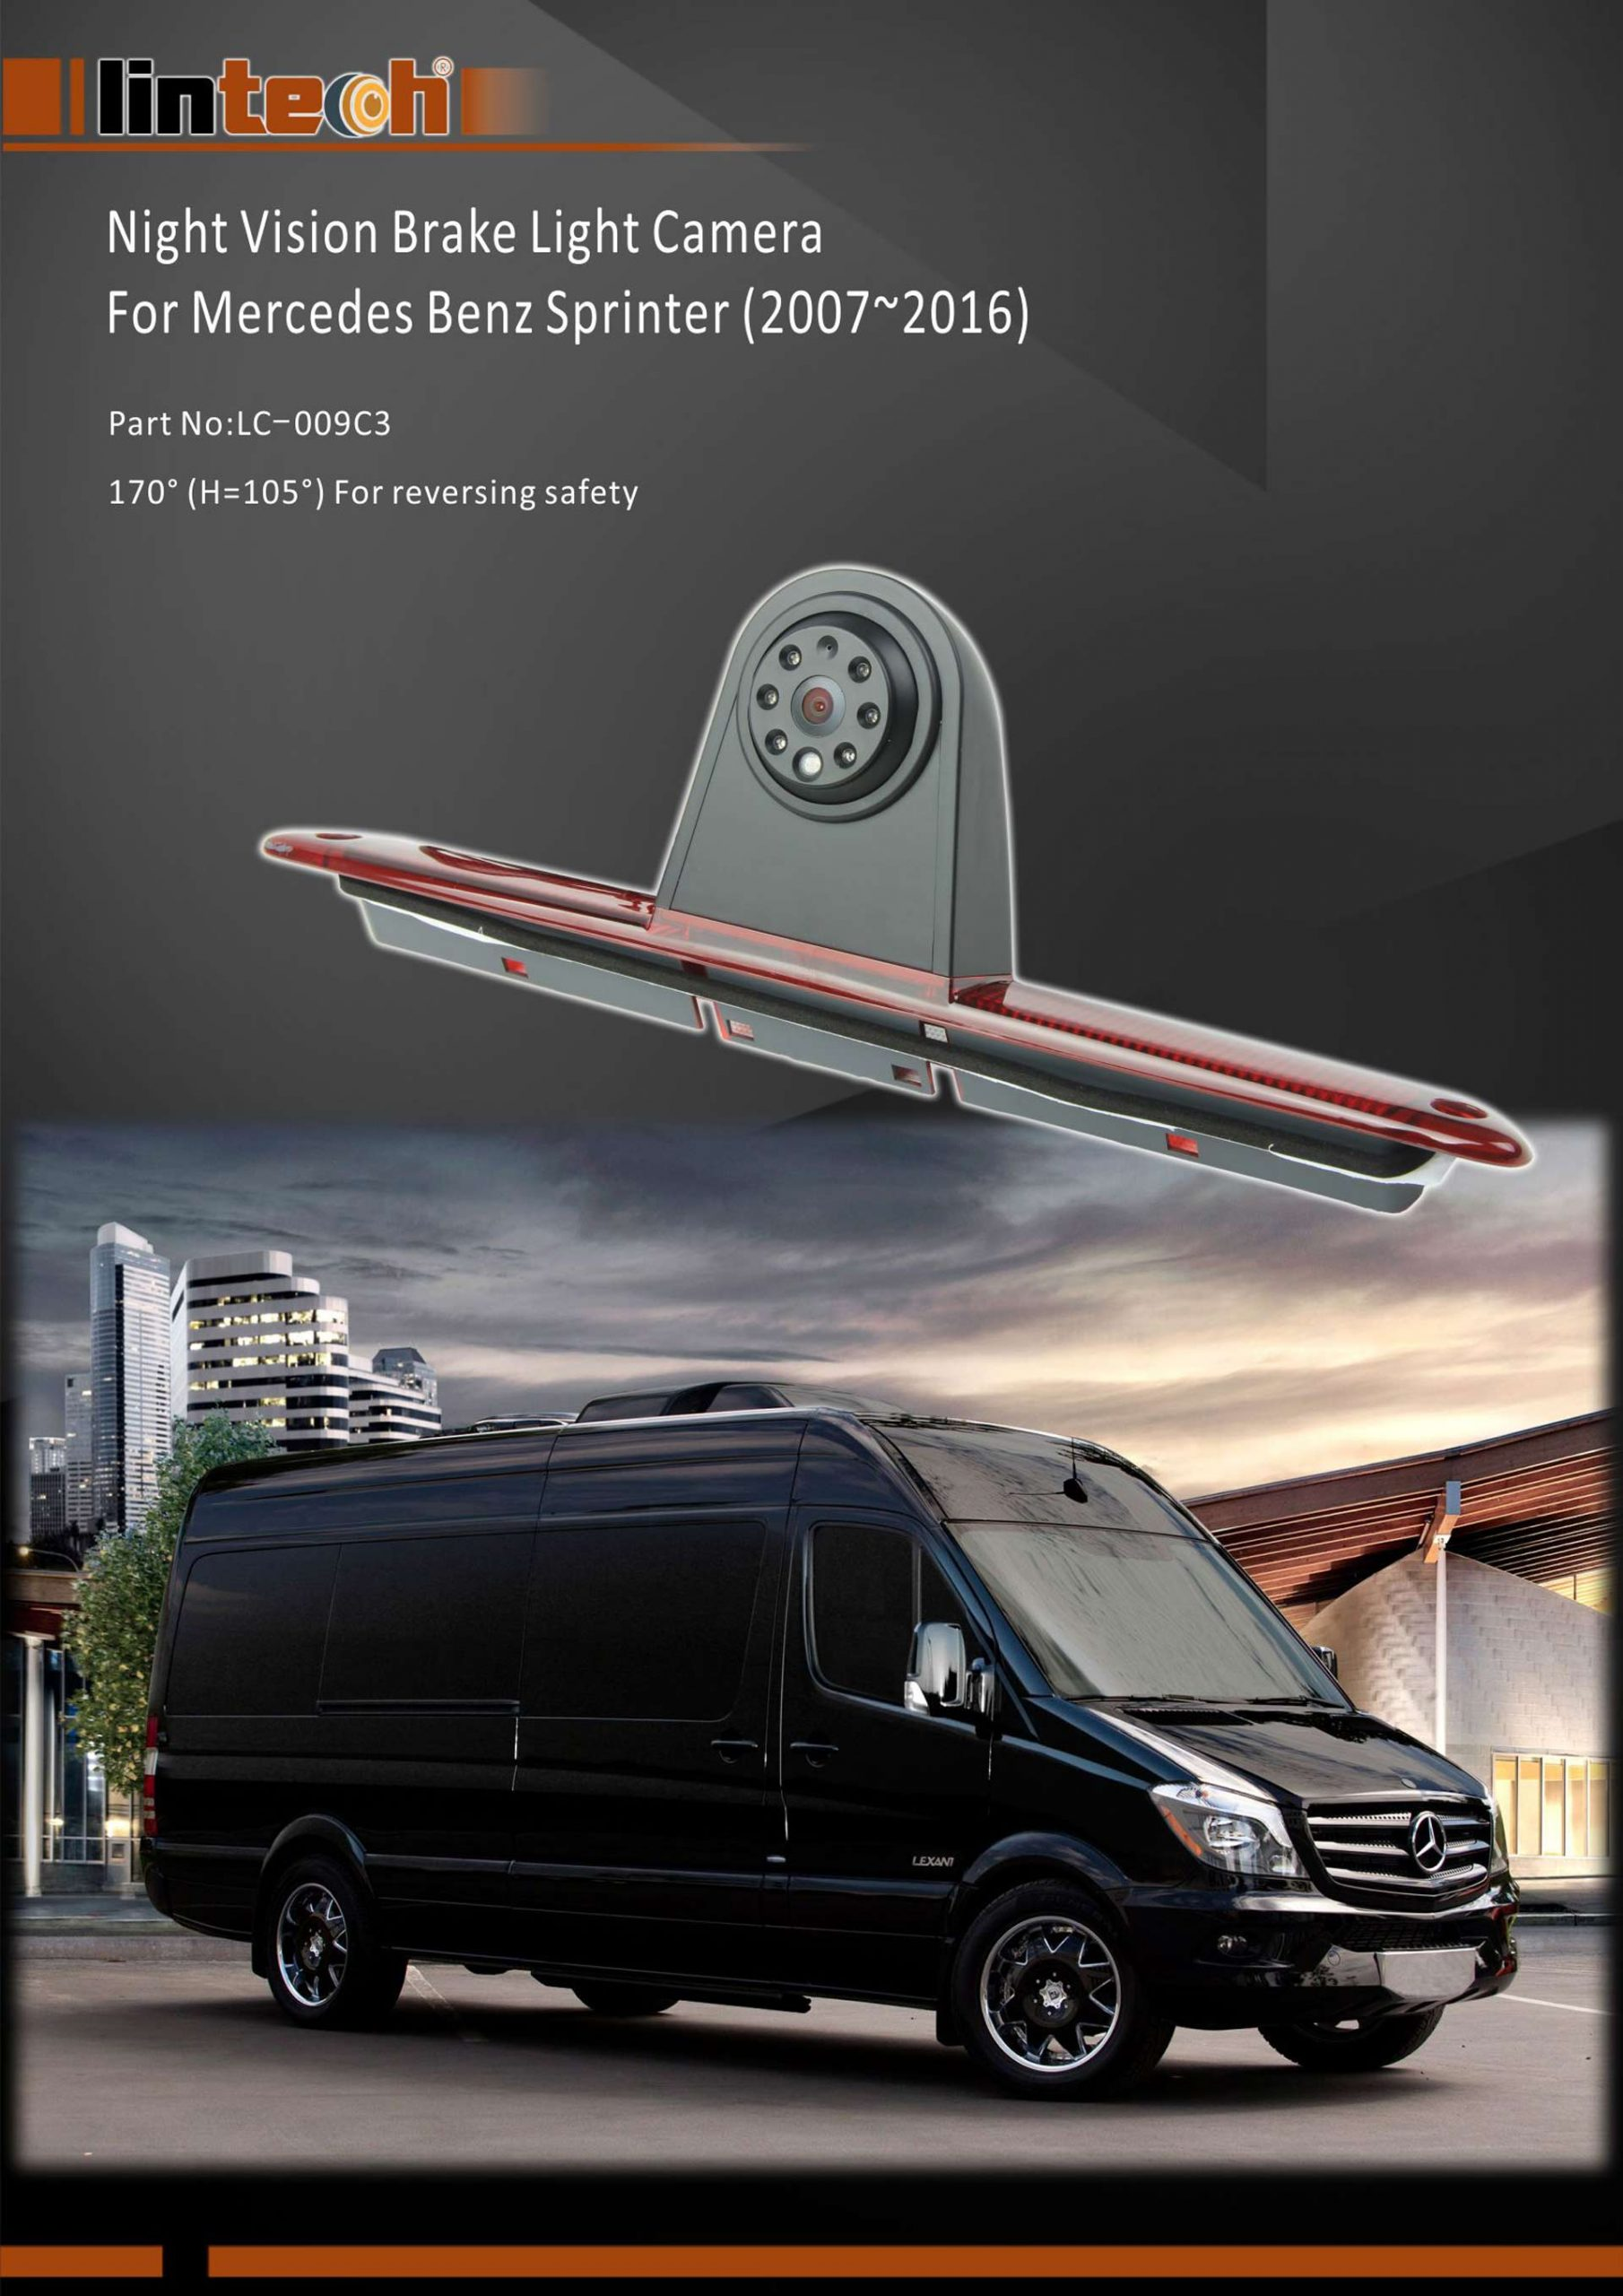 1. Night Vision Brake Light Camera for Mercedes Benz Sprinter